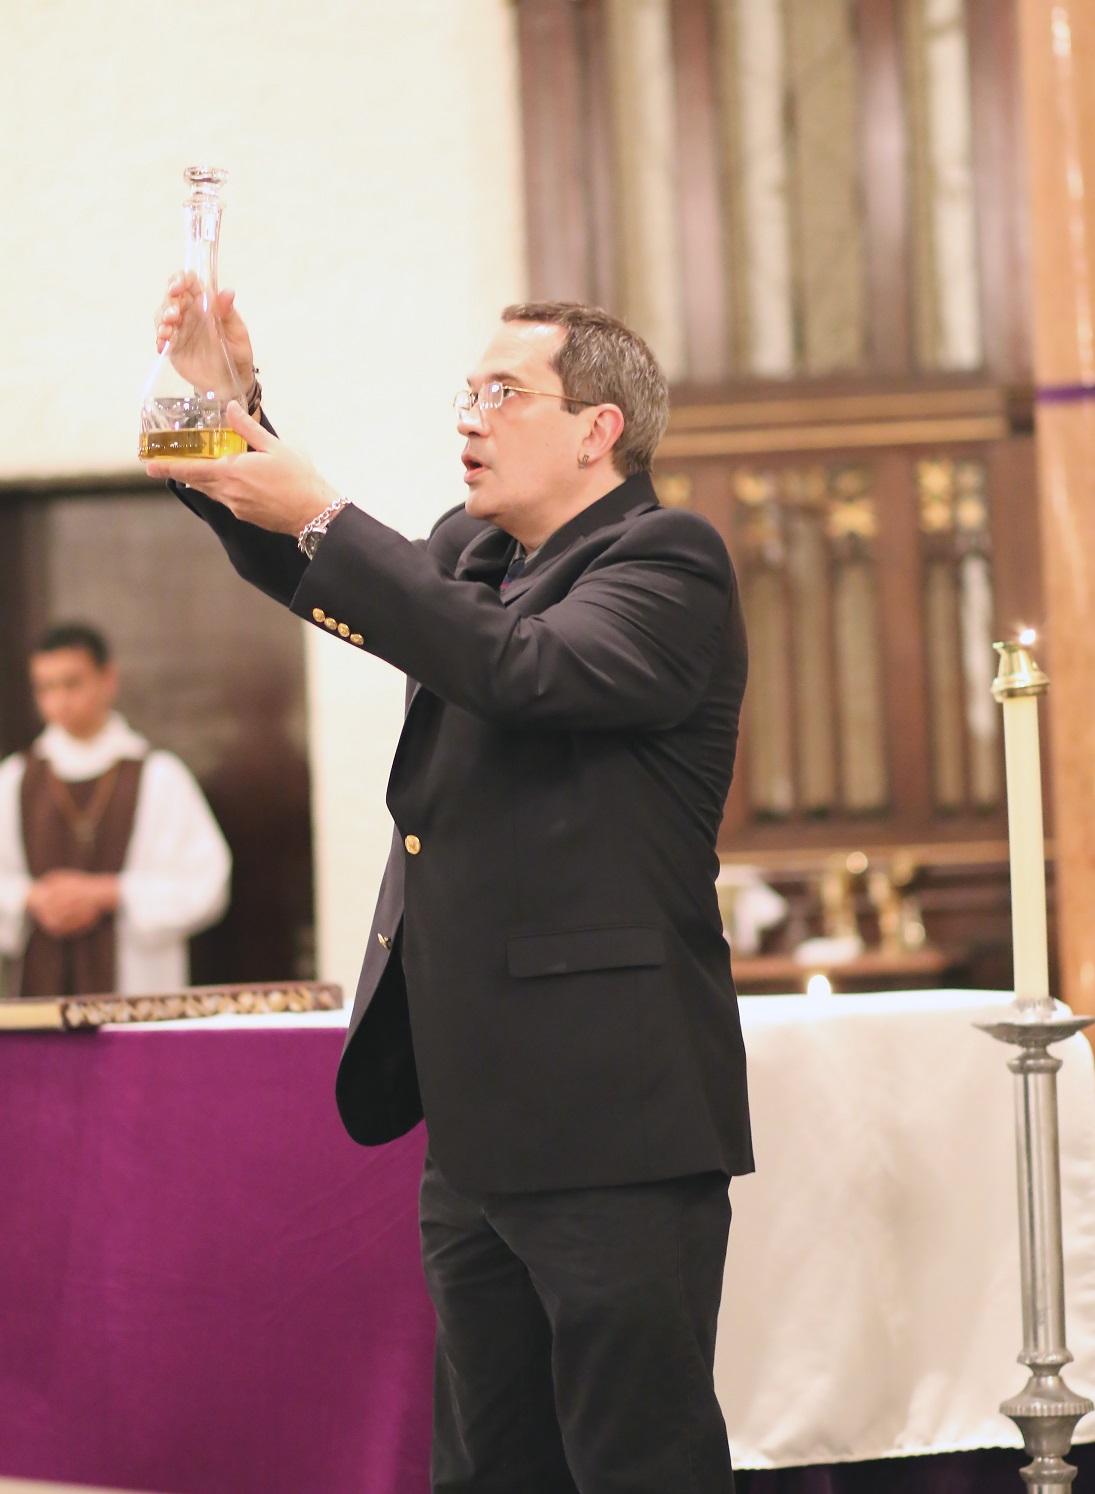 April 2014, Easter at St. Thomas the Apostle